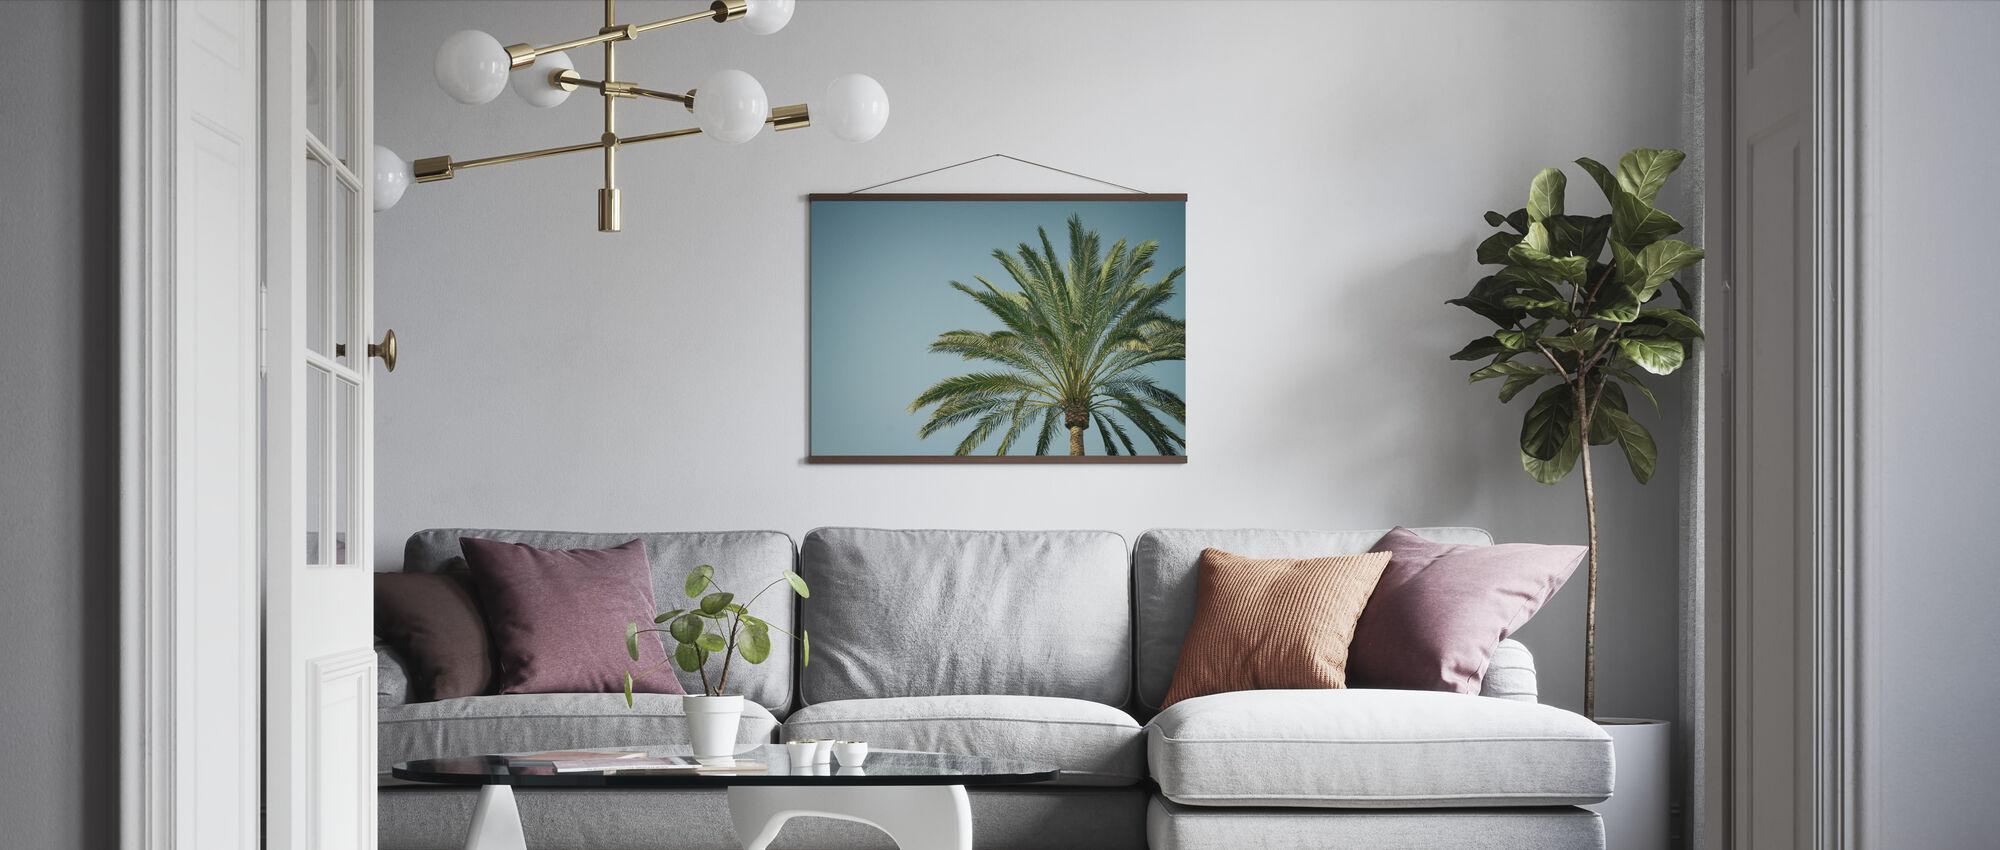 Solrik Hawaii - Plakat - Stue